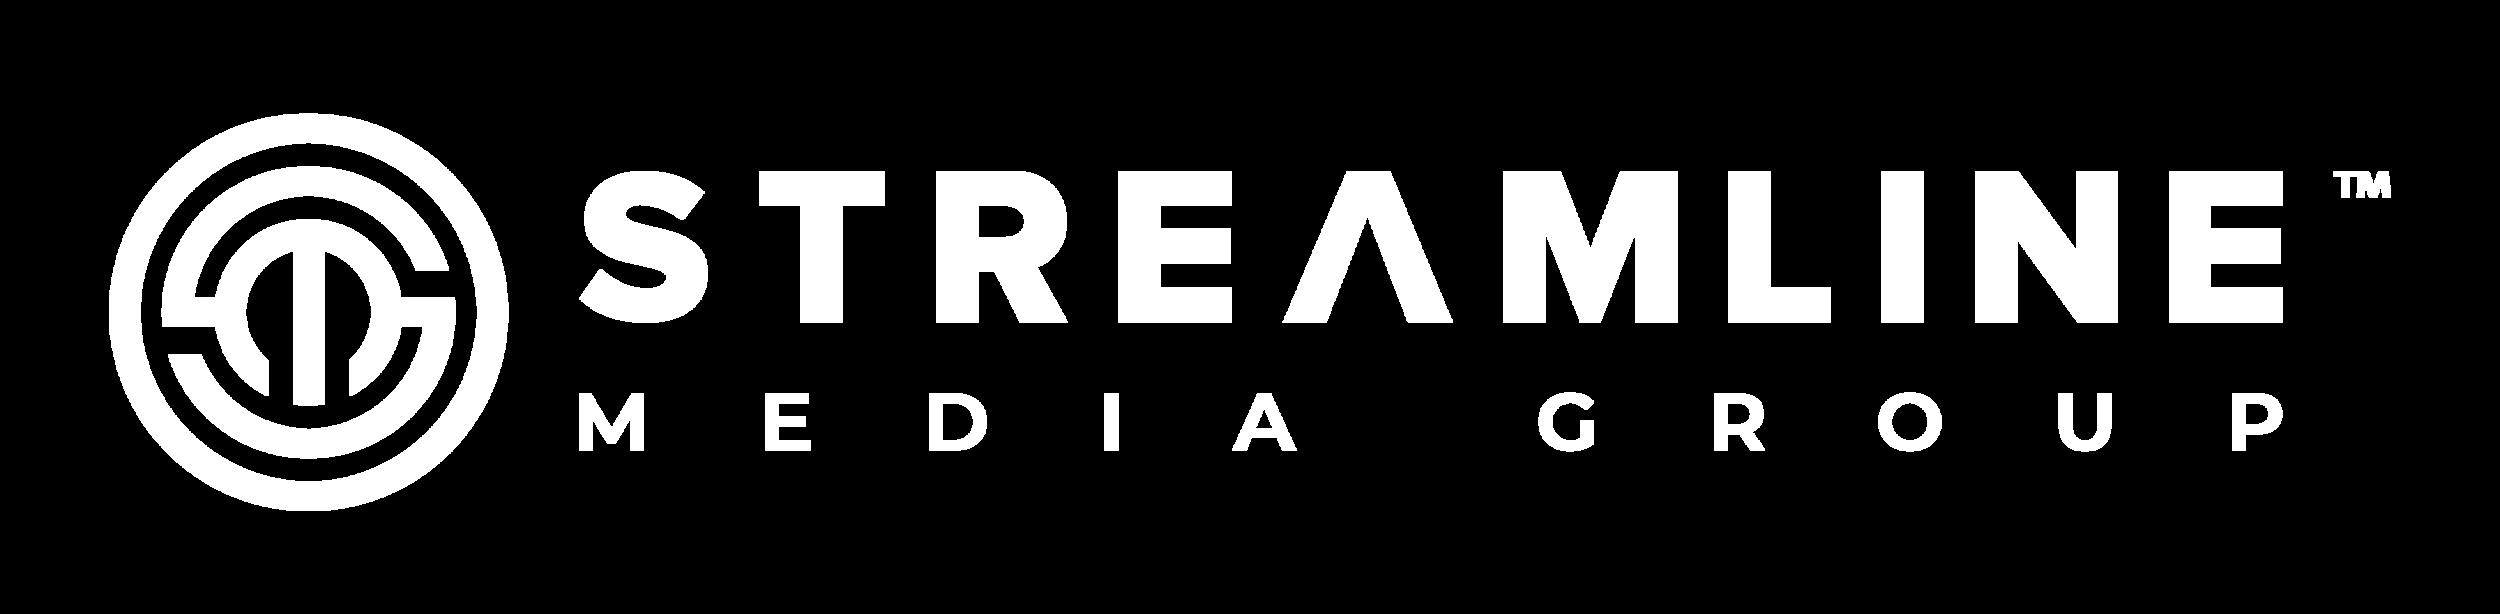 Streamline Media Group